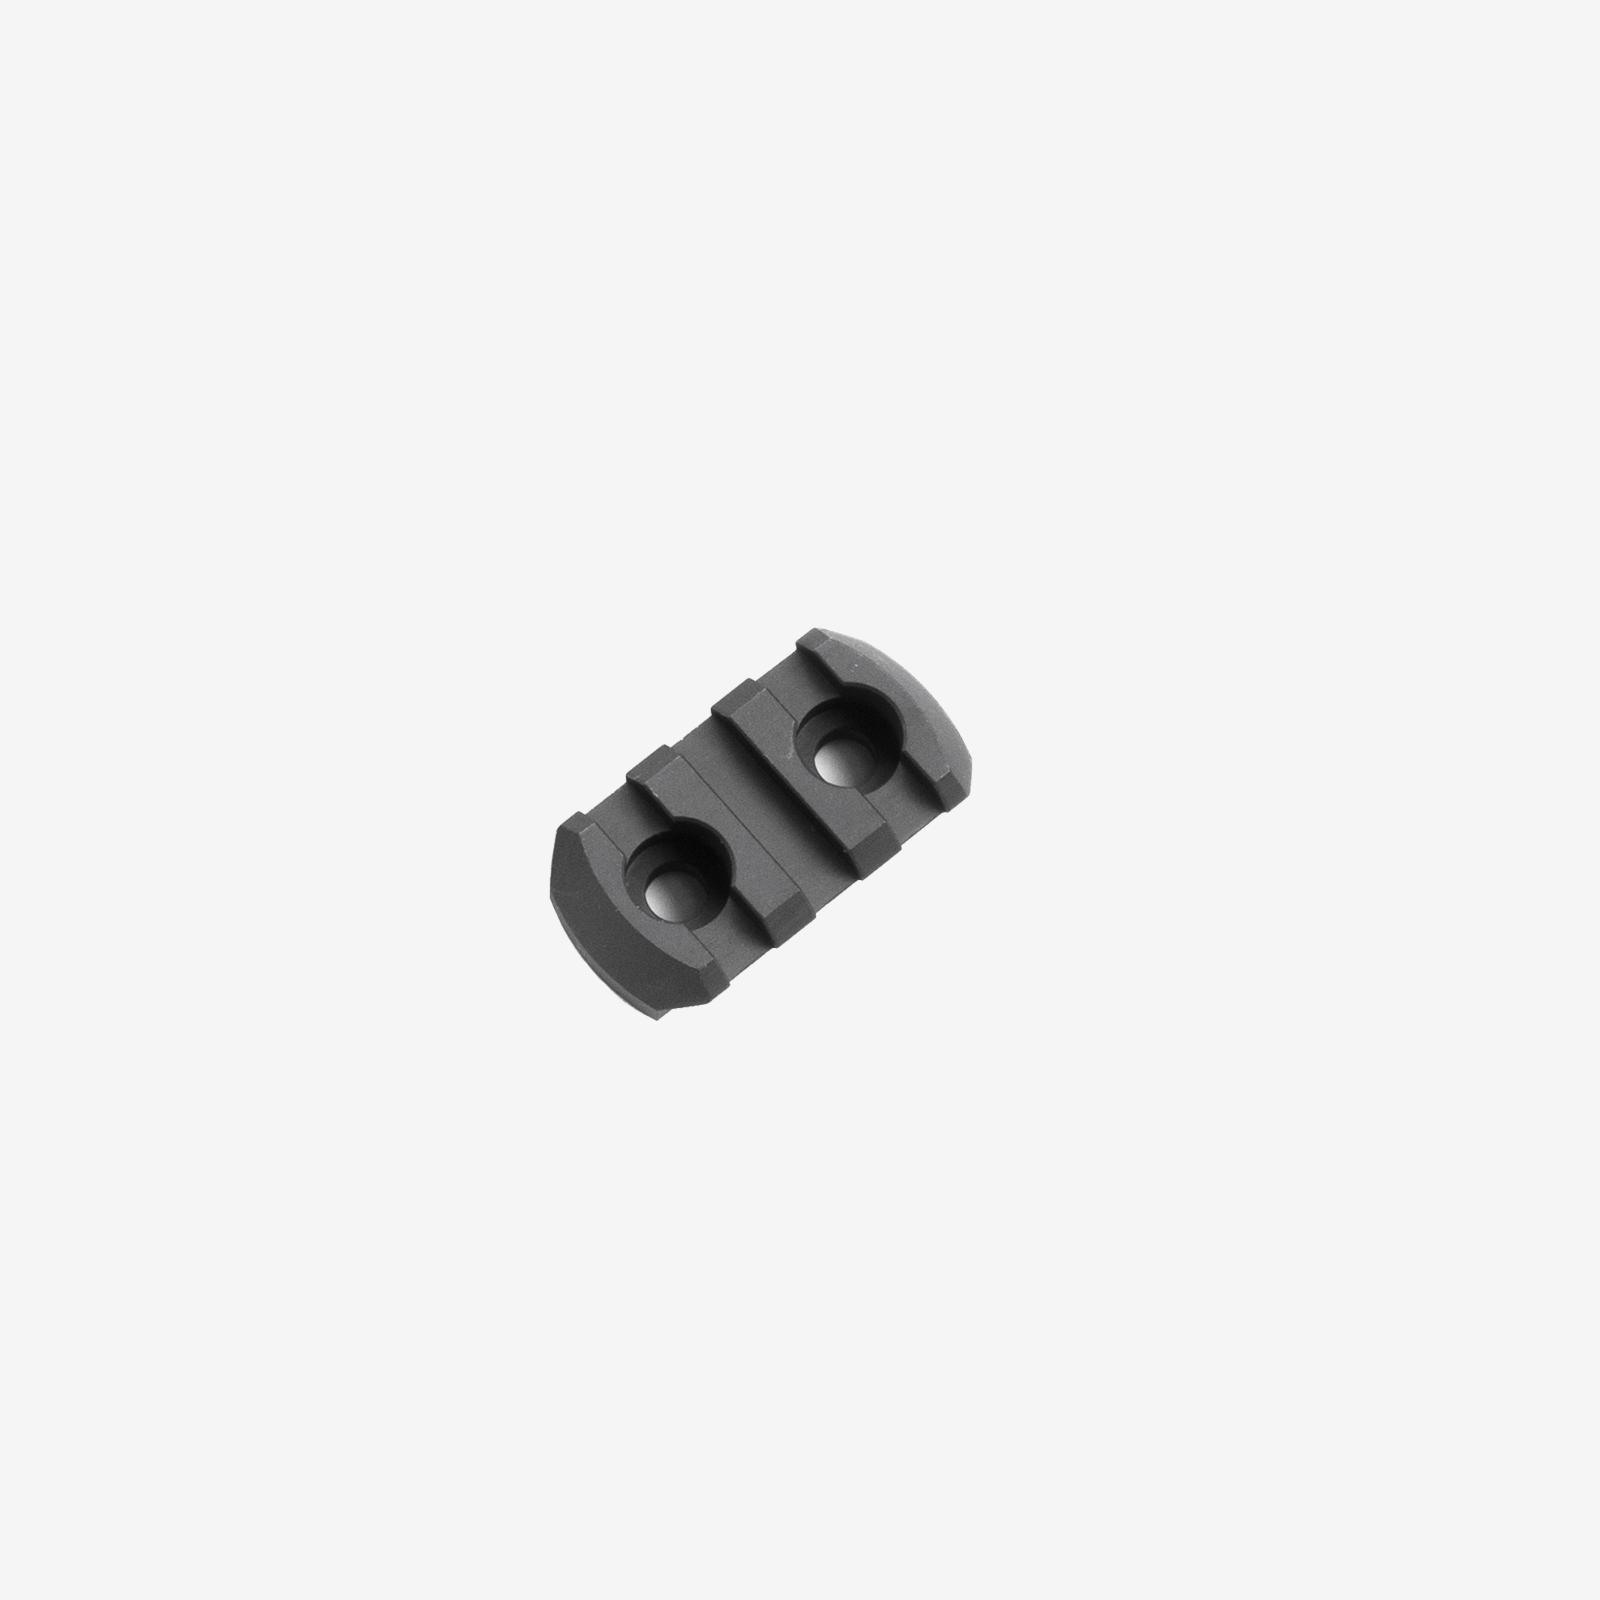 Magpul M-LOK Aluminium Picatinny Accessory Rails - Australian Tactical Precision